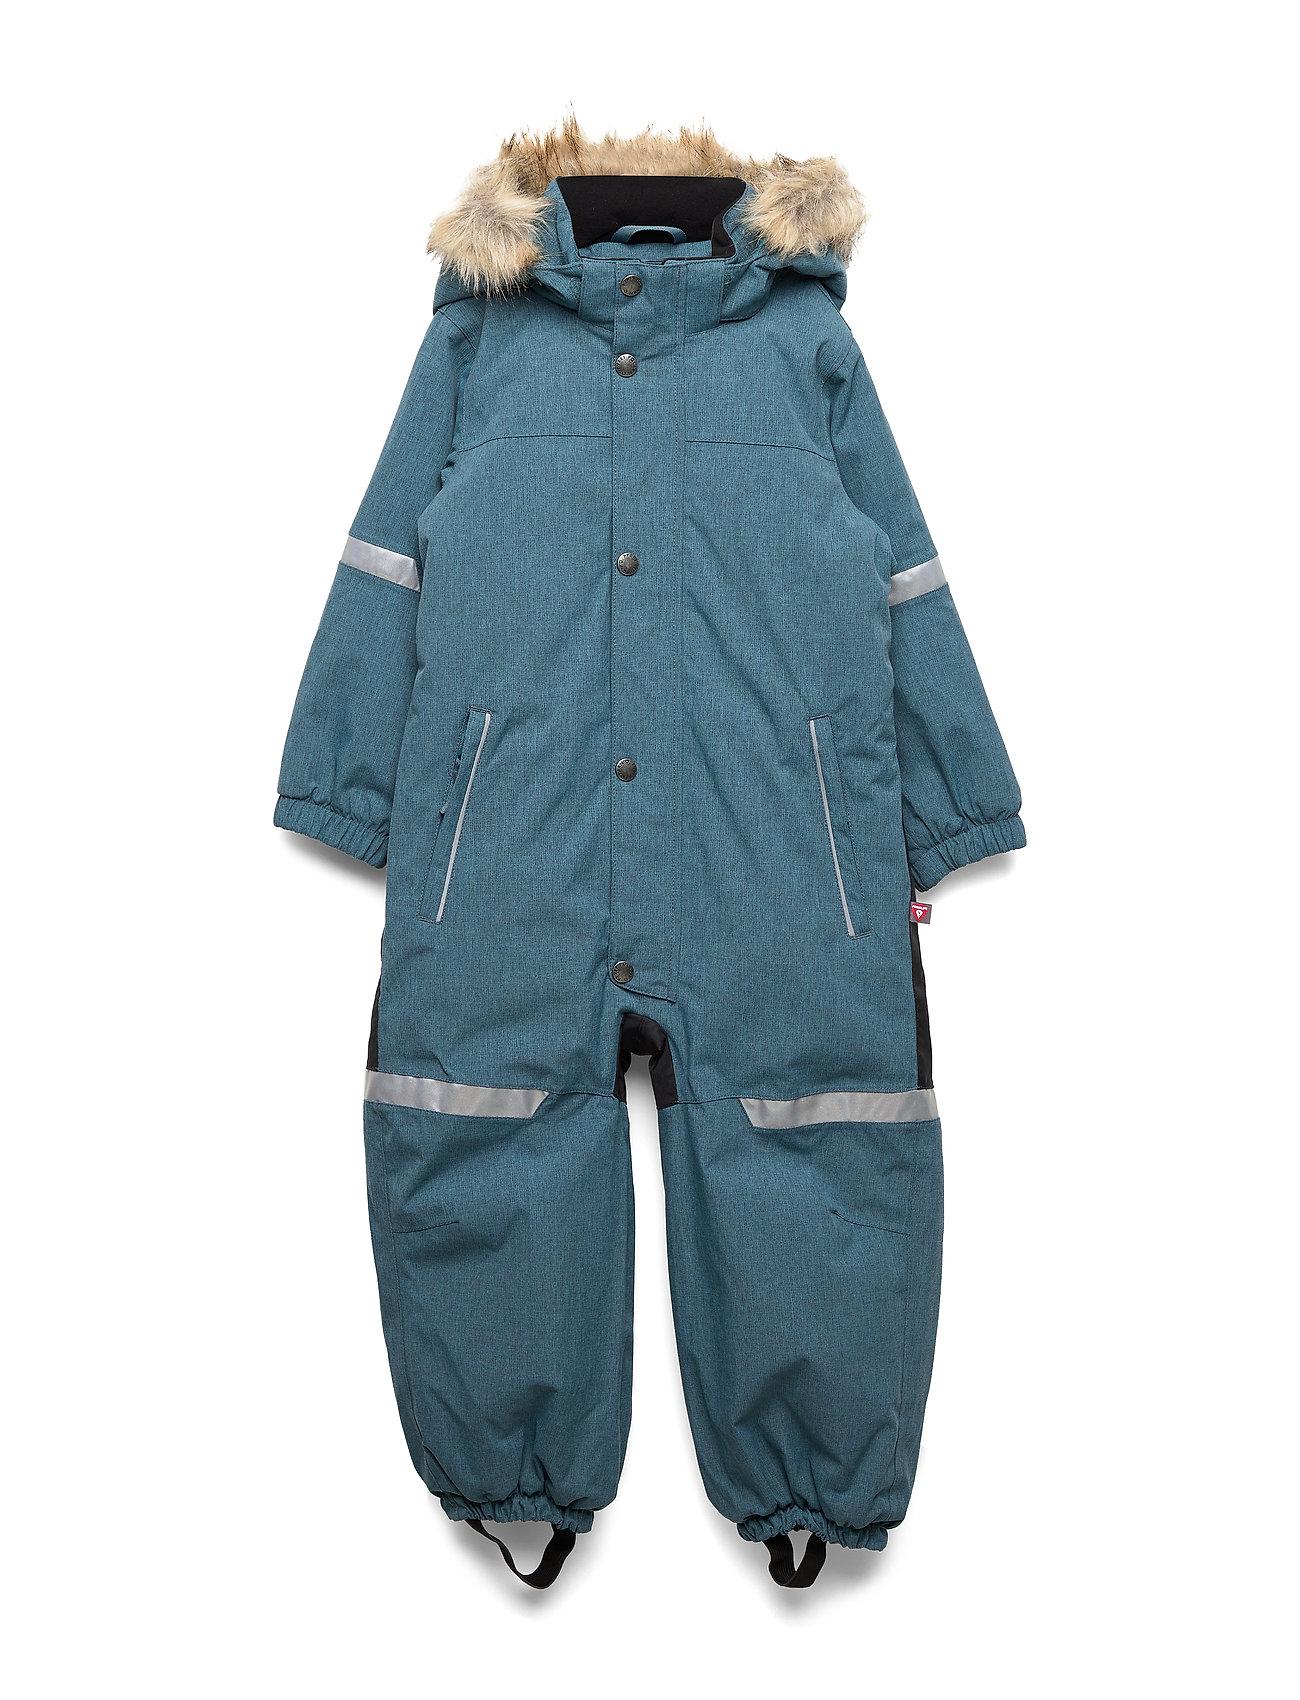 Polarn O. Pyret Overall Solid Preschool - STORM BLUE